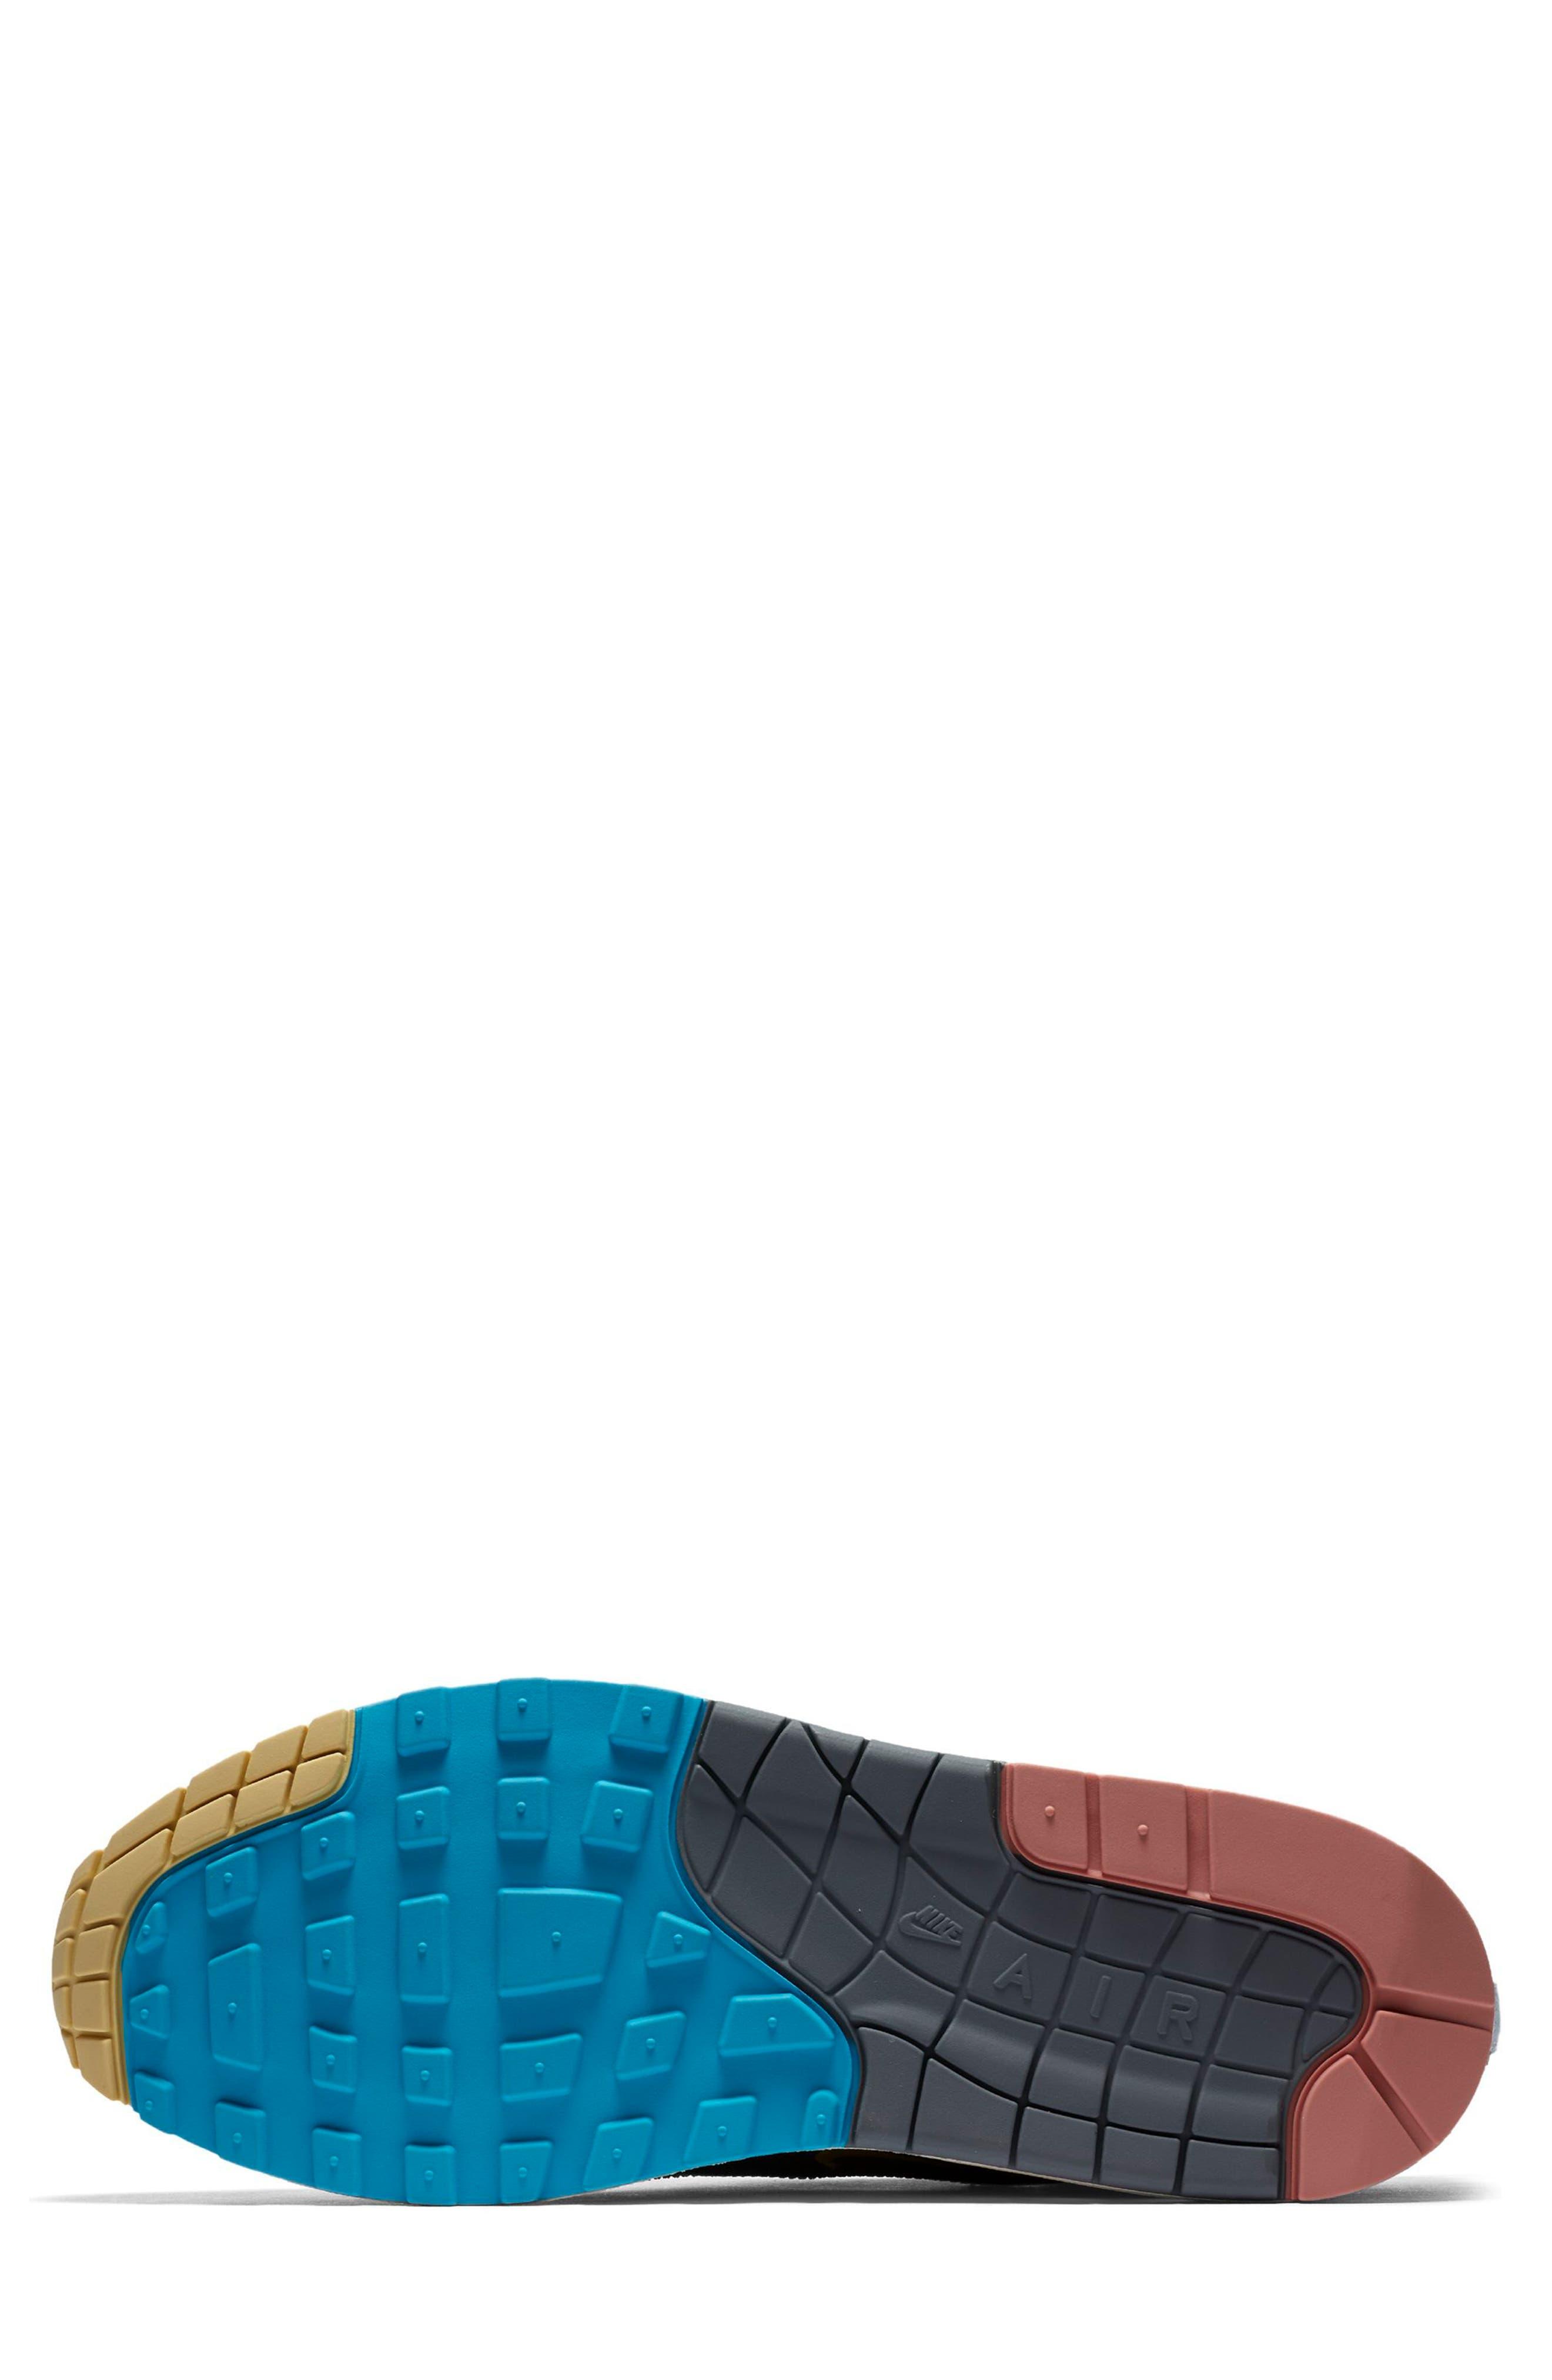 NIKE,                             Air Max 1/97 VF SW Sneaker,                             Alternate thumbnail 5, color,                             400